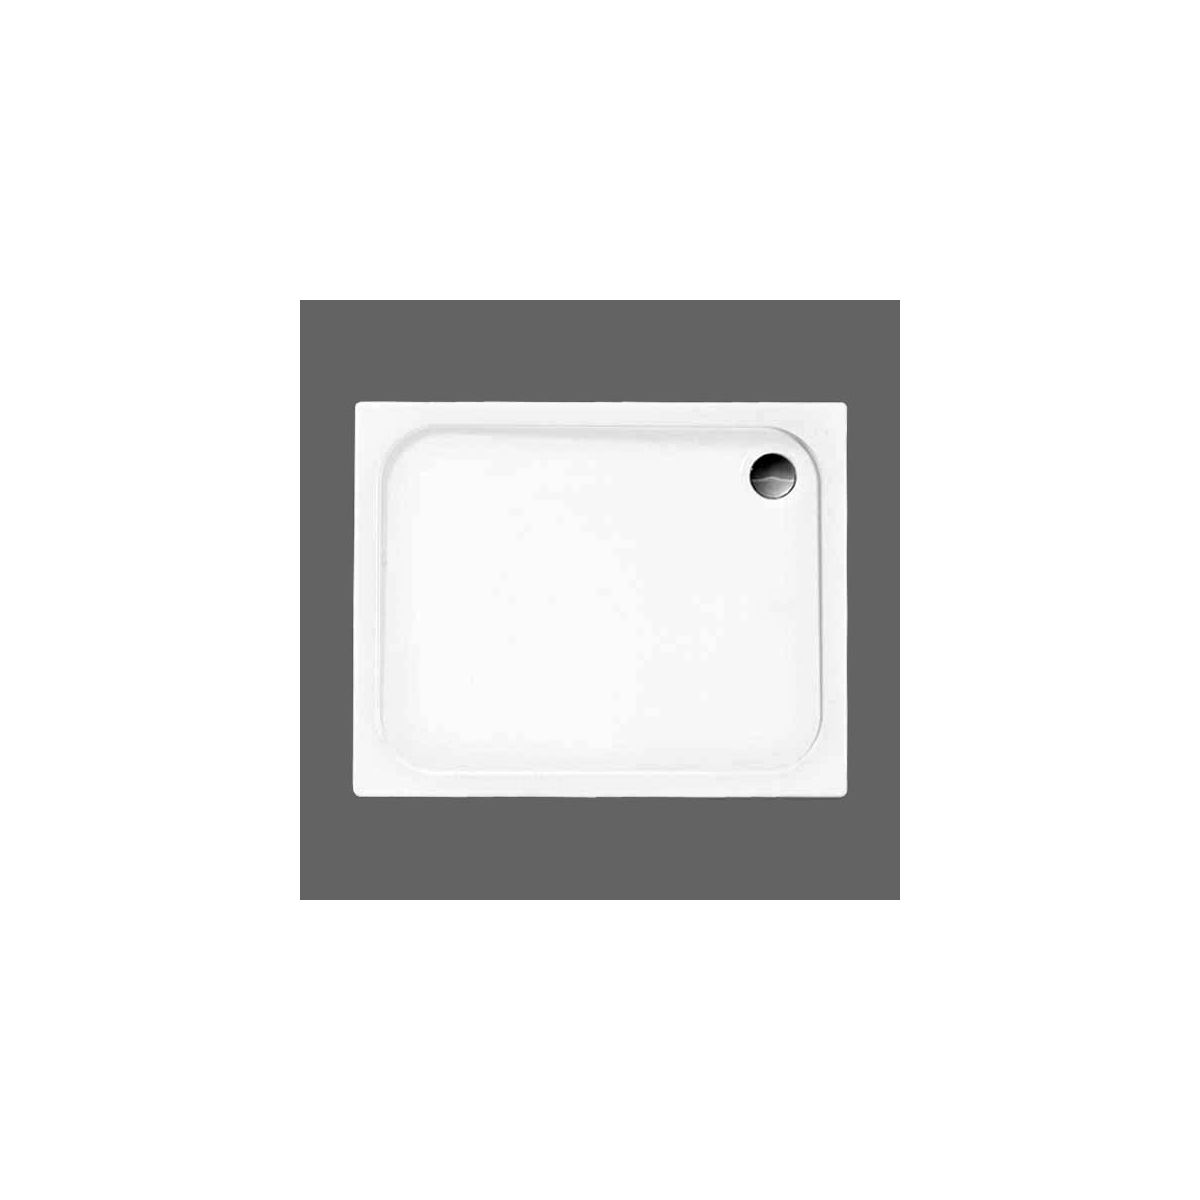 merlyn-mstone-rectangular-shower-tray-1500-x-800mm